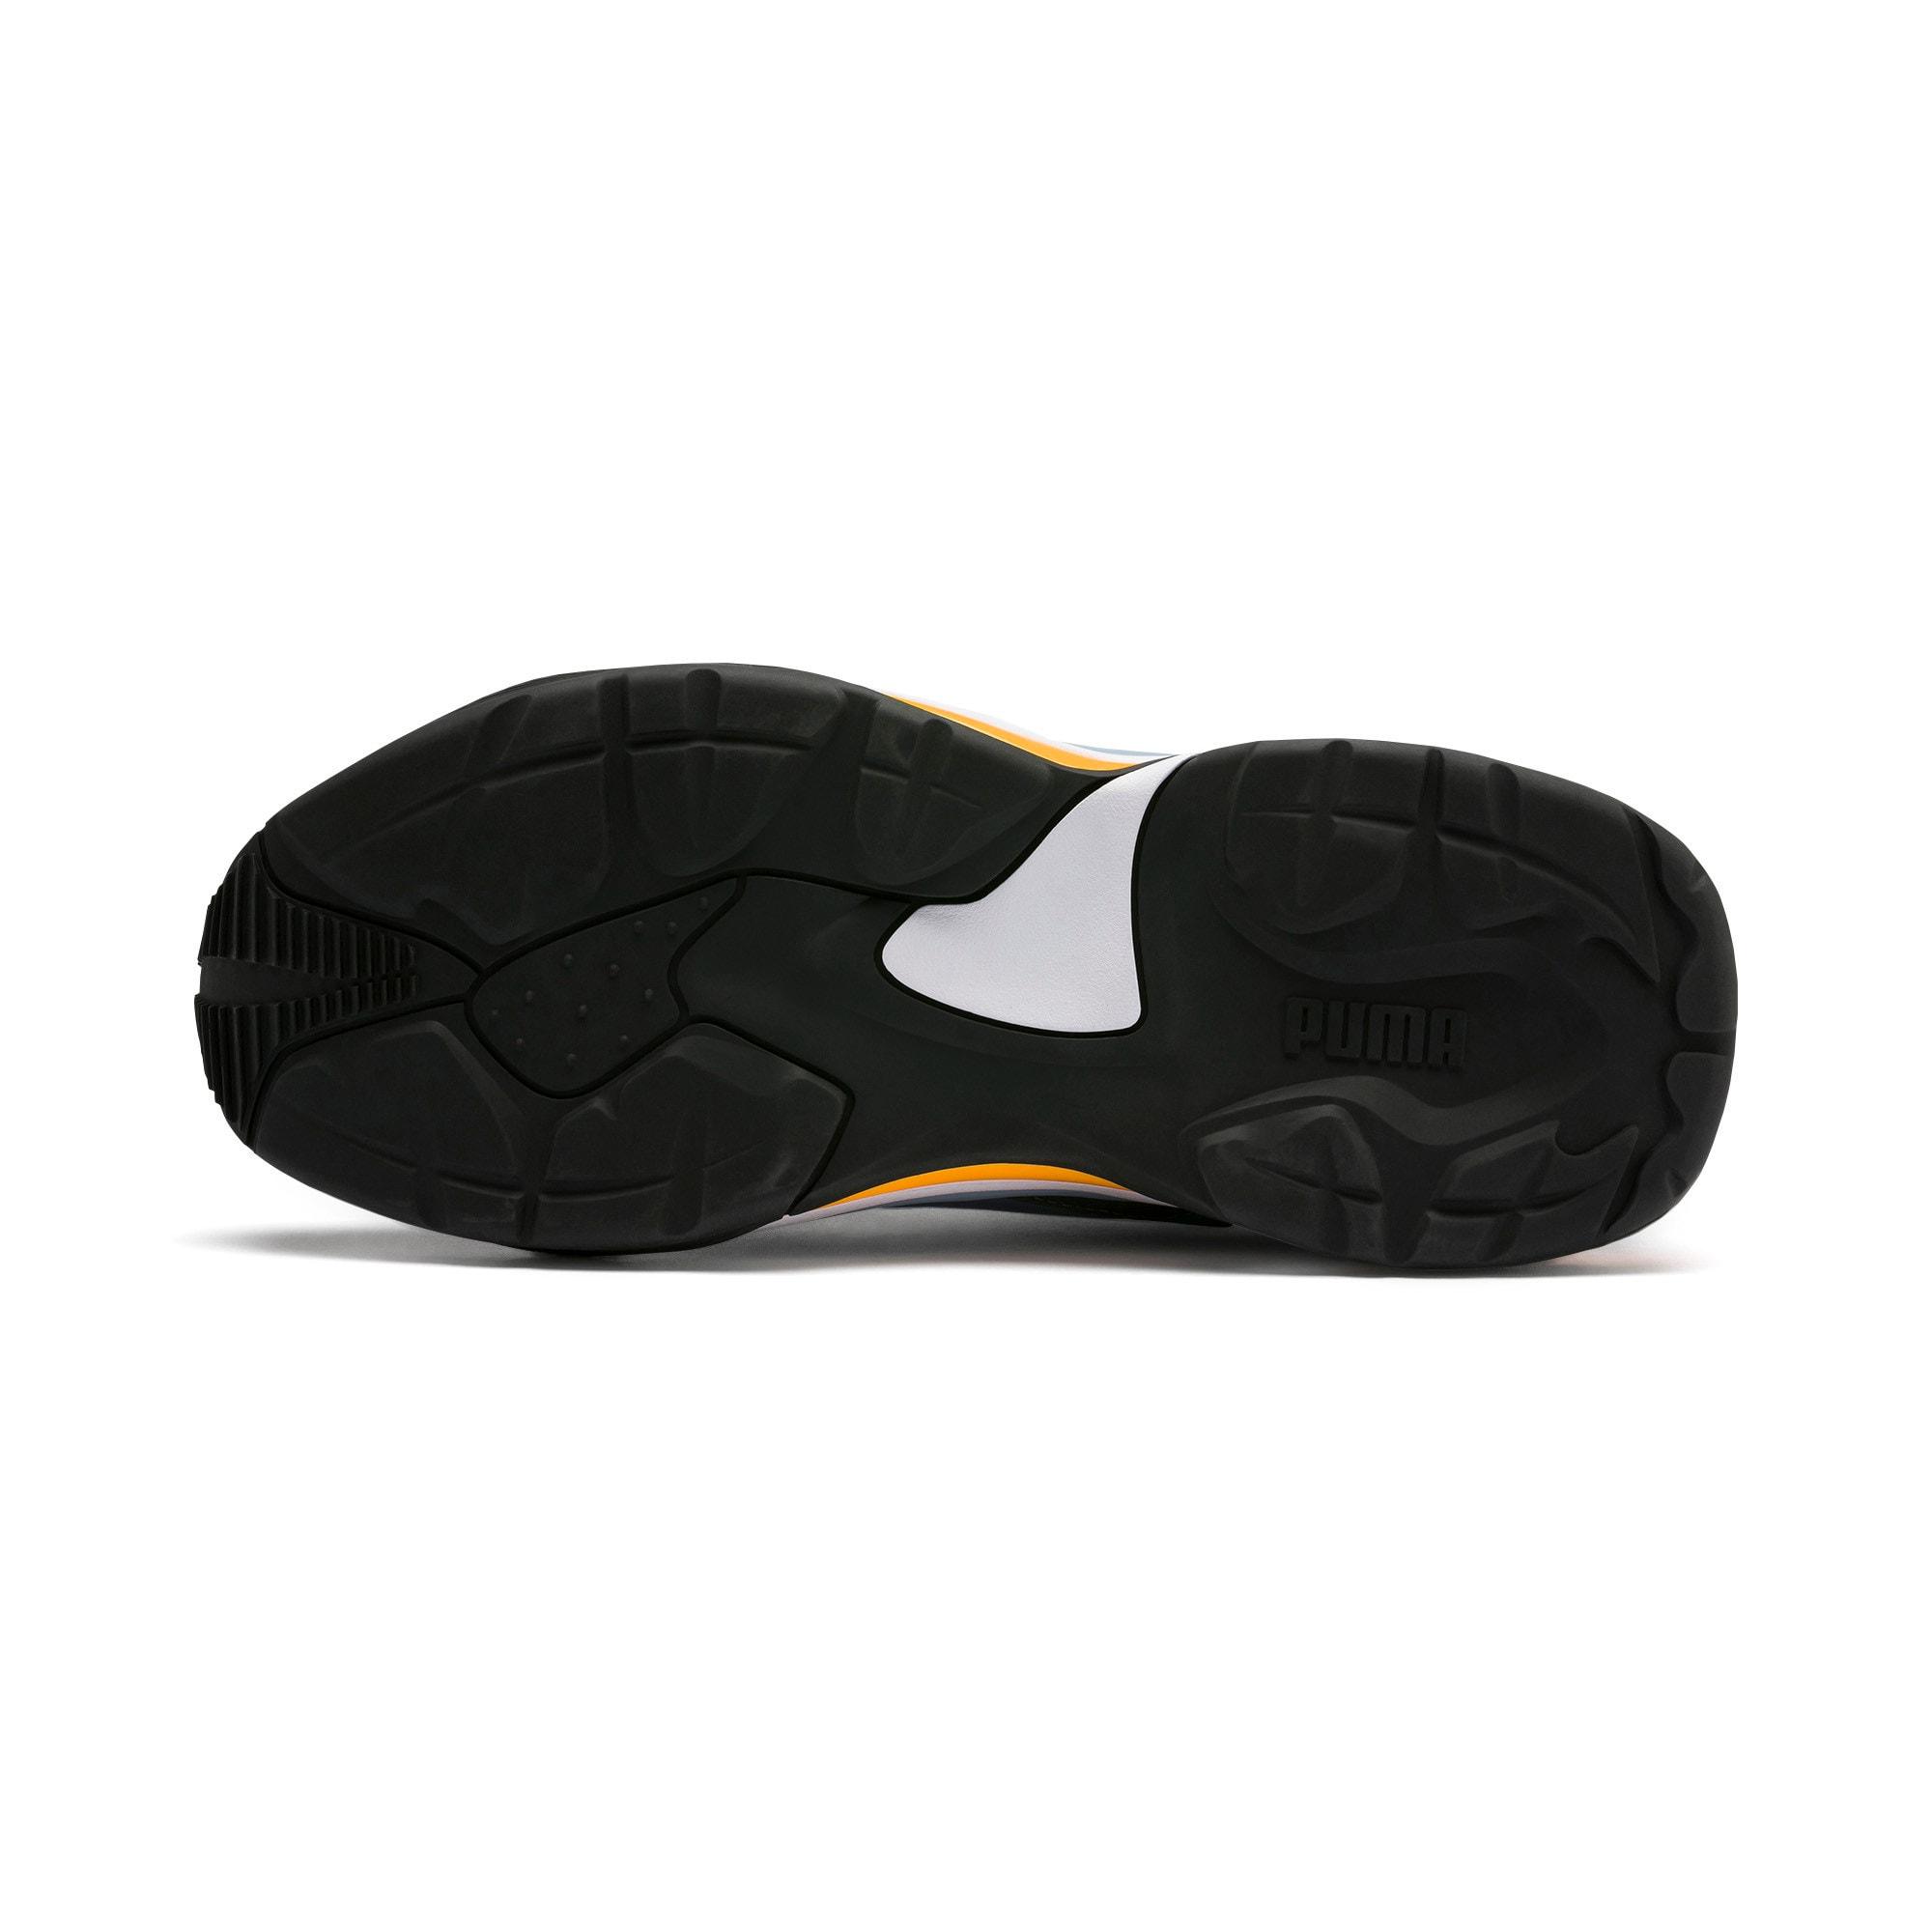 Thumbnail 5 of Thunder Fashion 2.0 Trainers, P Black-Faded Denim-P White, medium